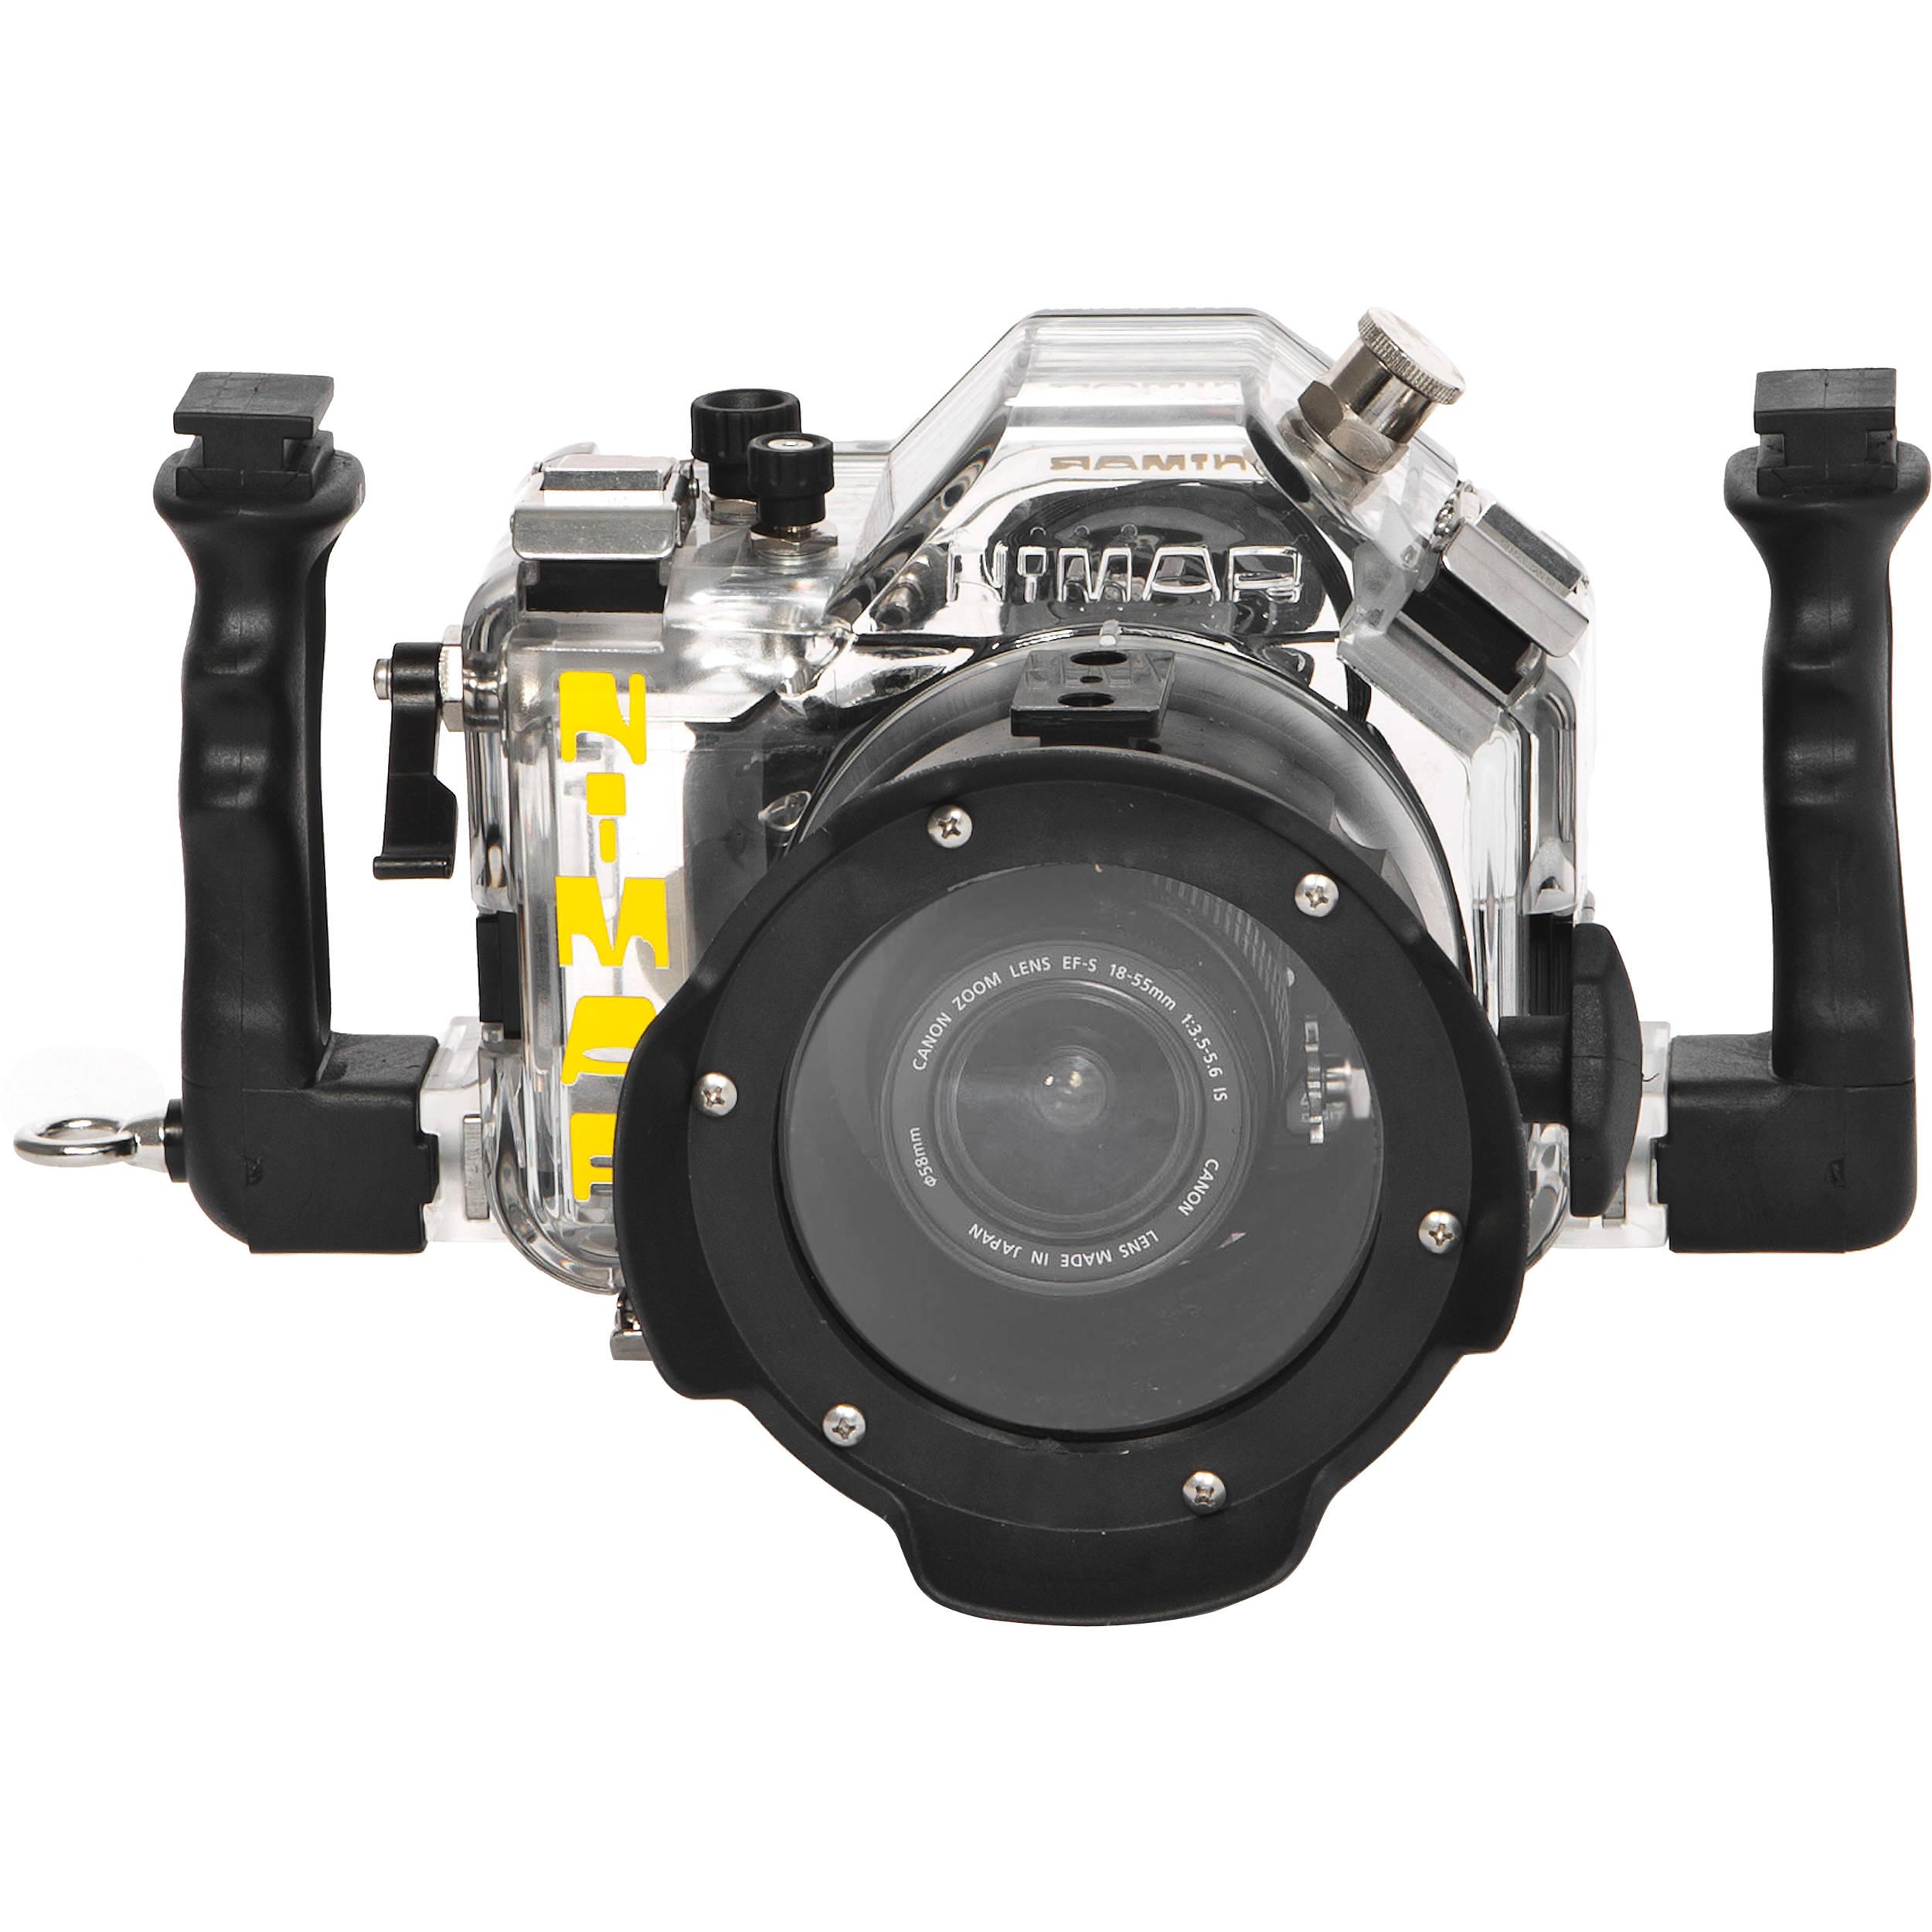 nimar underwater housing for canon eos rebel ni3dc400zmq b h rh bhphotovideo com Canon EOS Digital Rebel Canon EOS Rebel XTi Troubleshooting